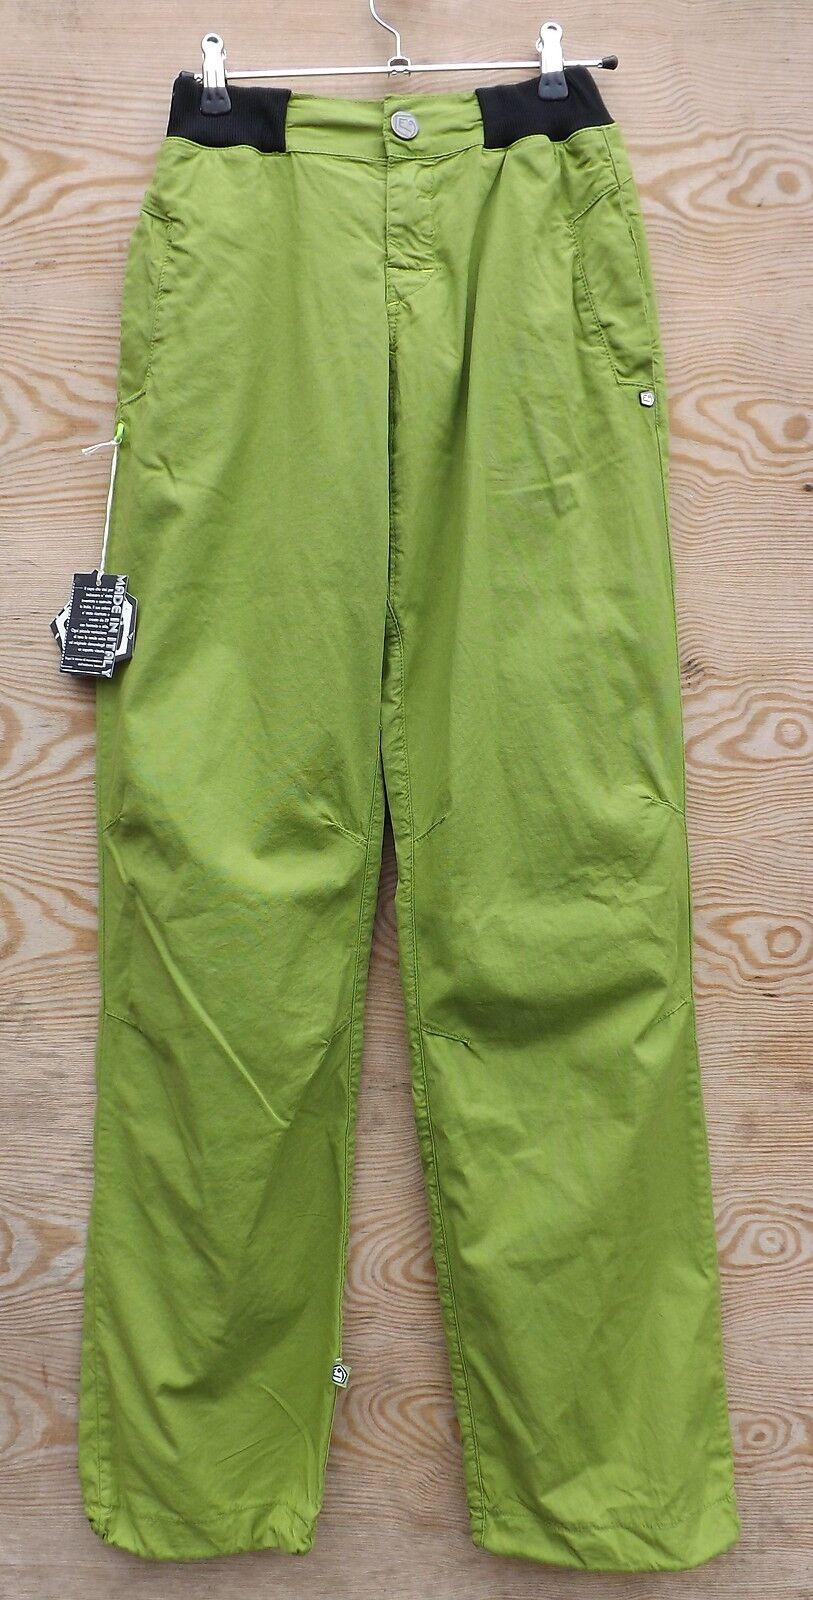 E9 Kletterhose für Damen Fior, Gr. XL, apple